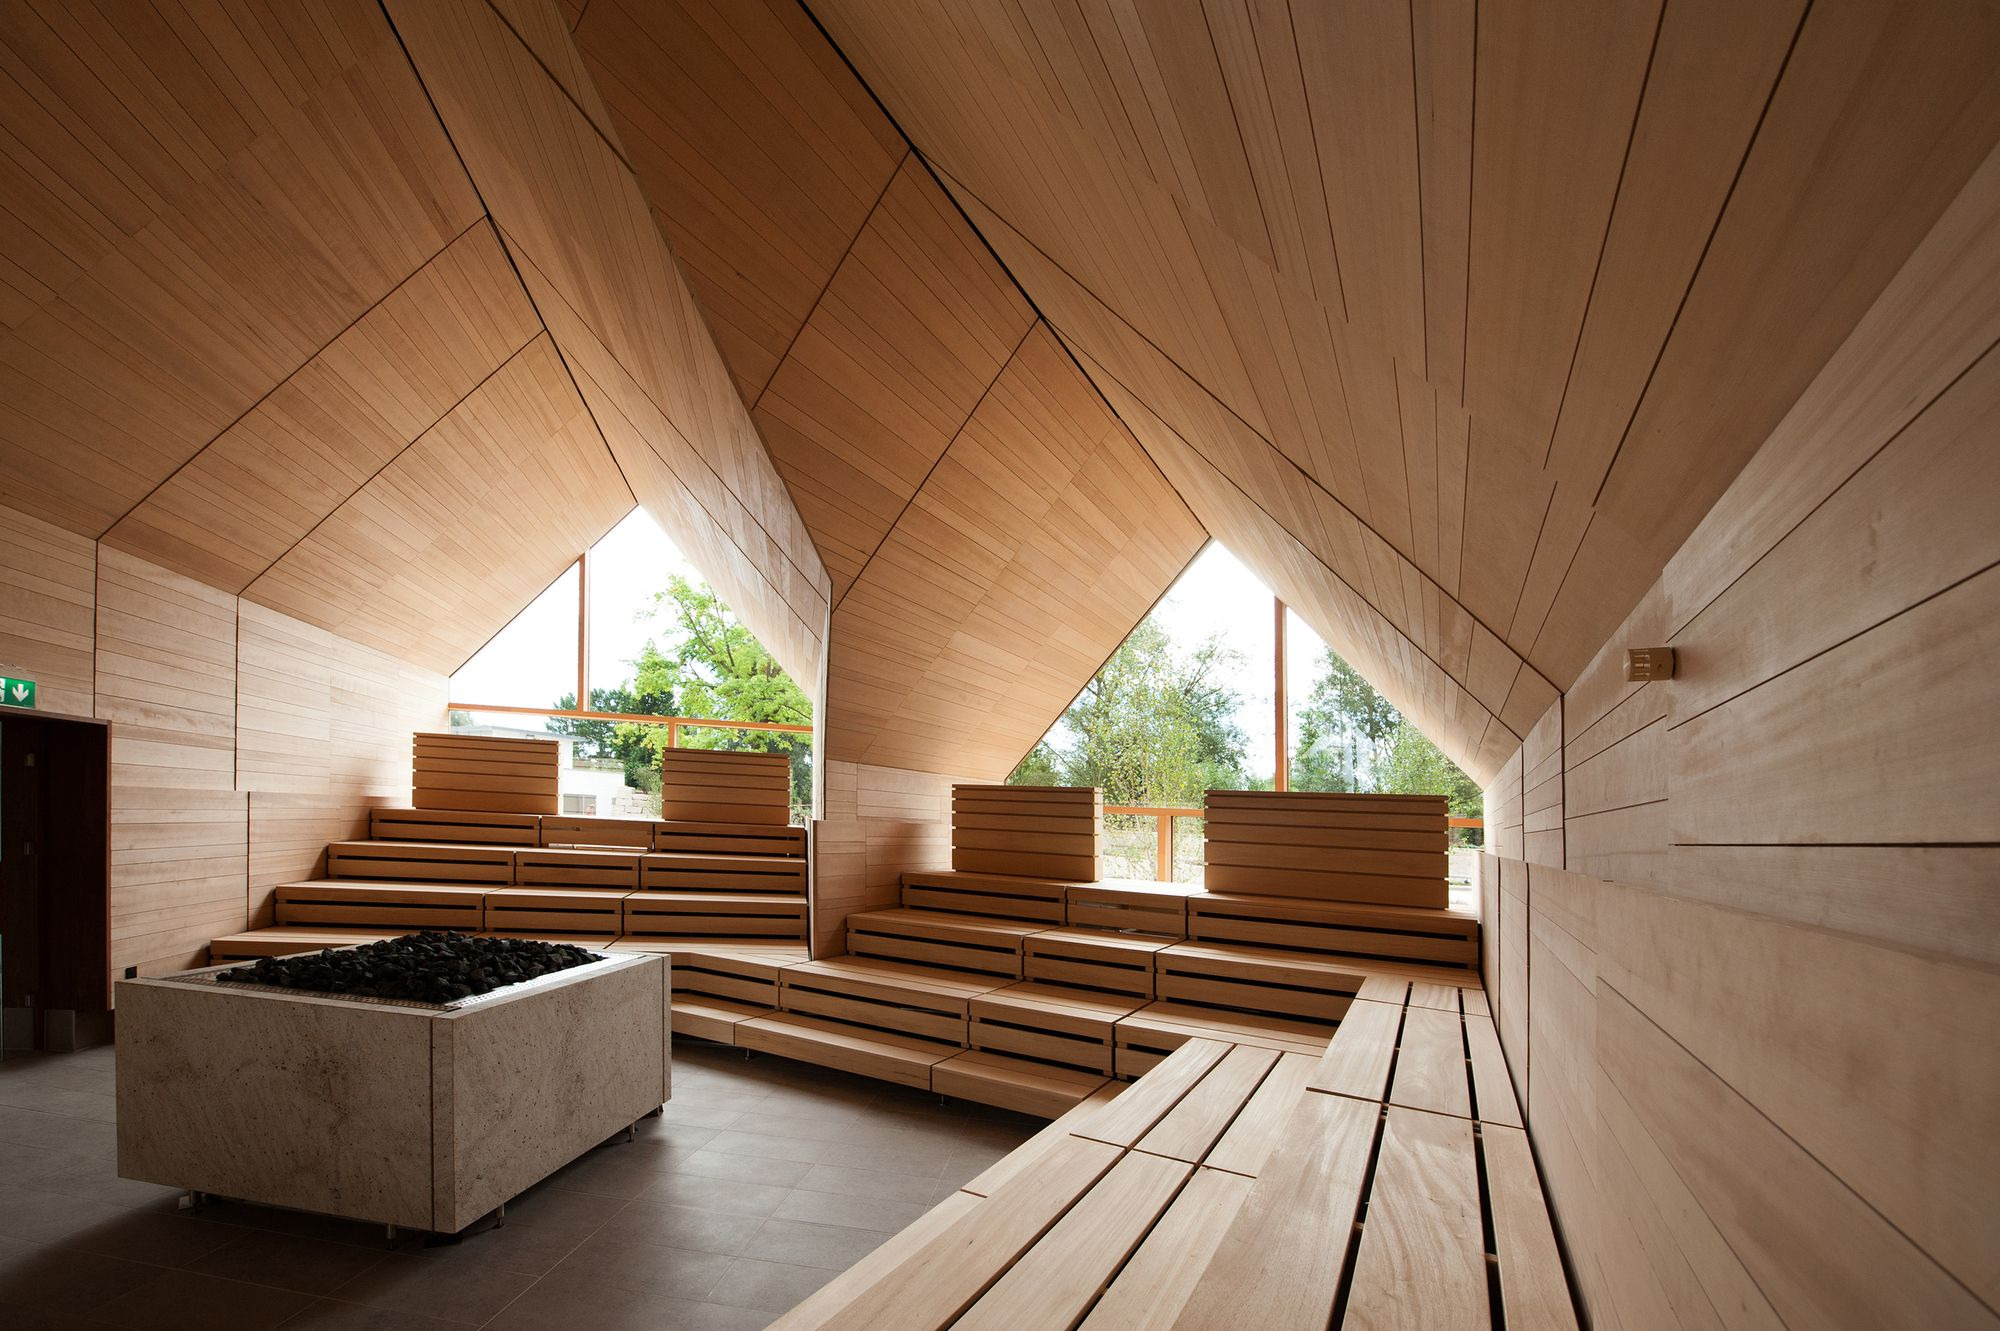 Jordanbad Sauna Village / Jeschke Architektur&Planung | Saunas ...